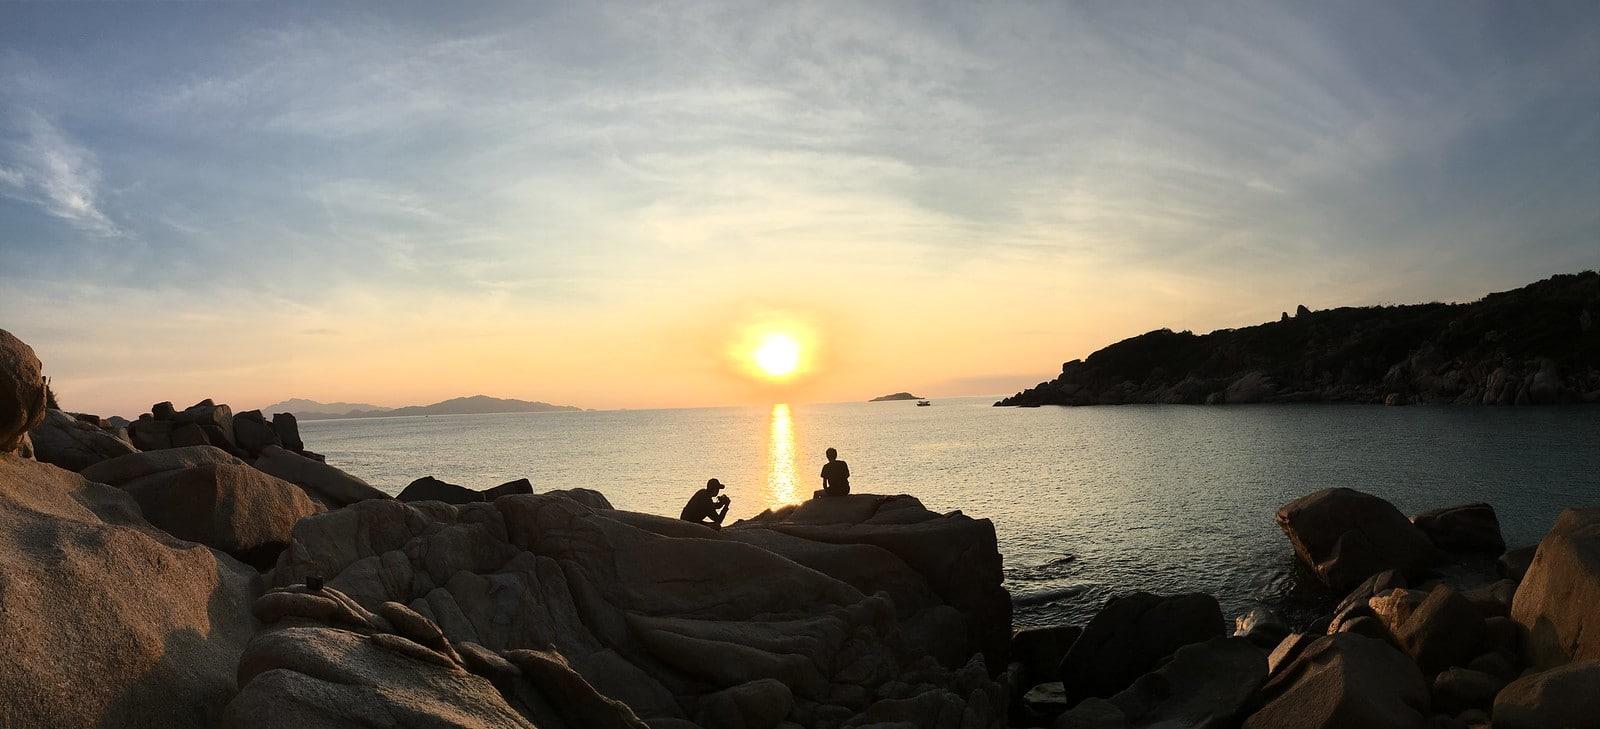 Beach Sunset in Cam Ranh Vietnam